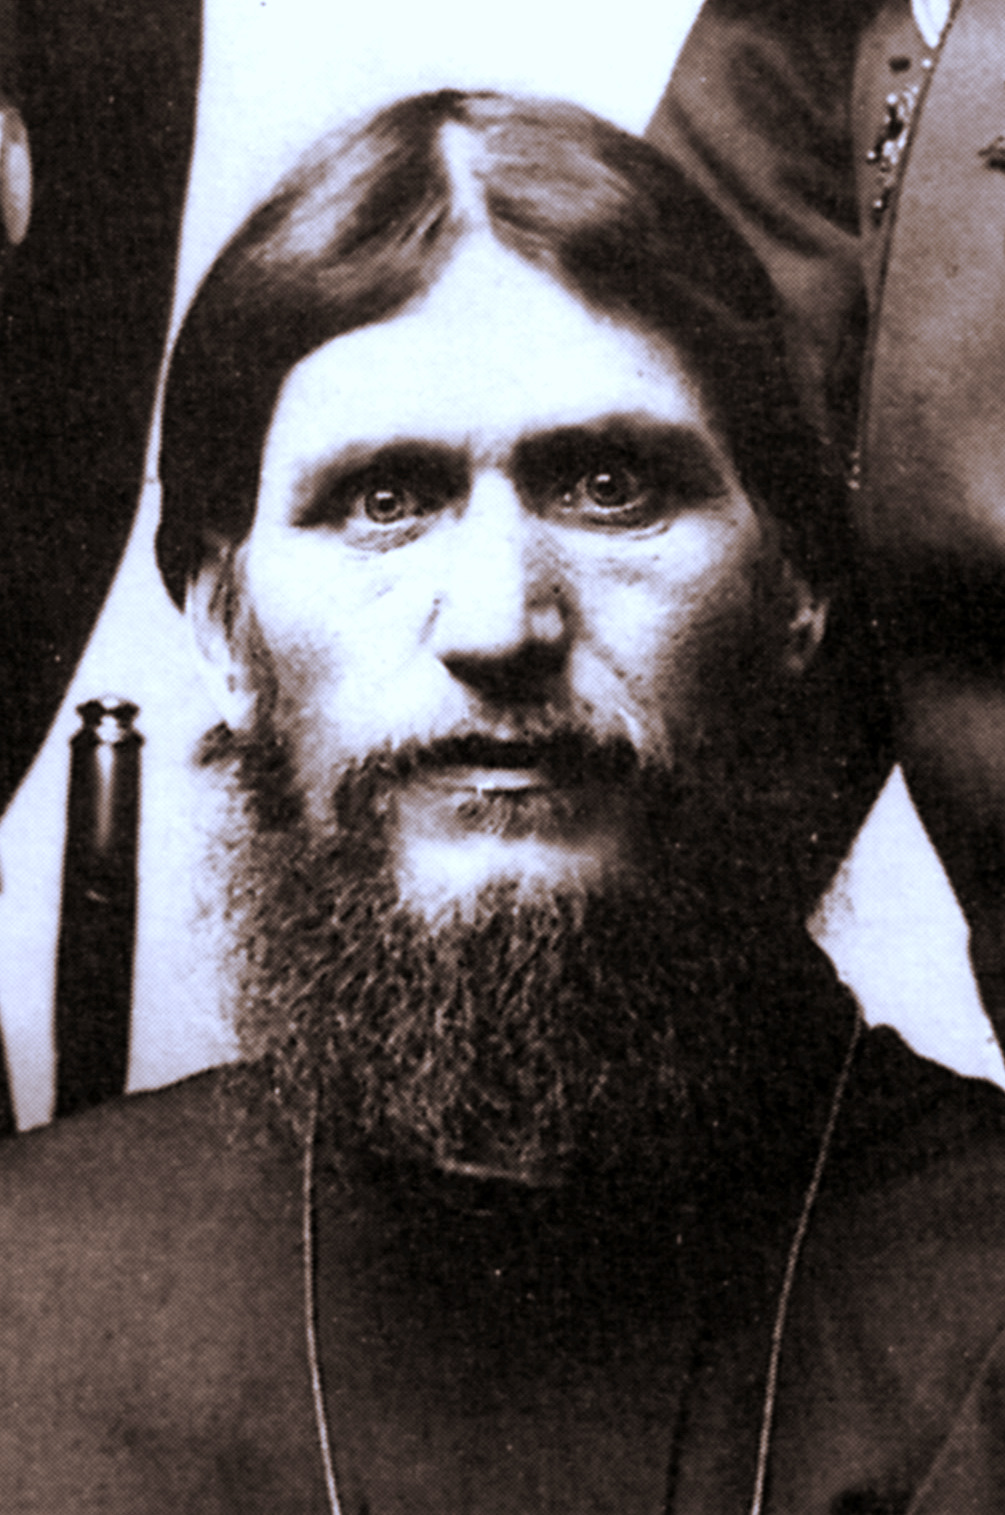 Rasputin-Big-photos-2-crop.jpg